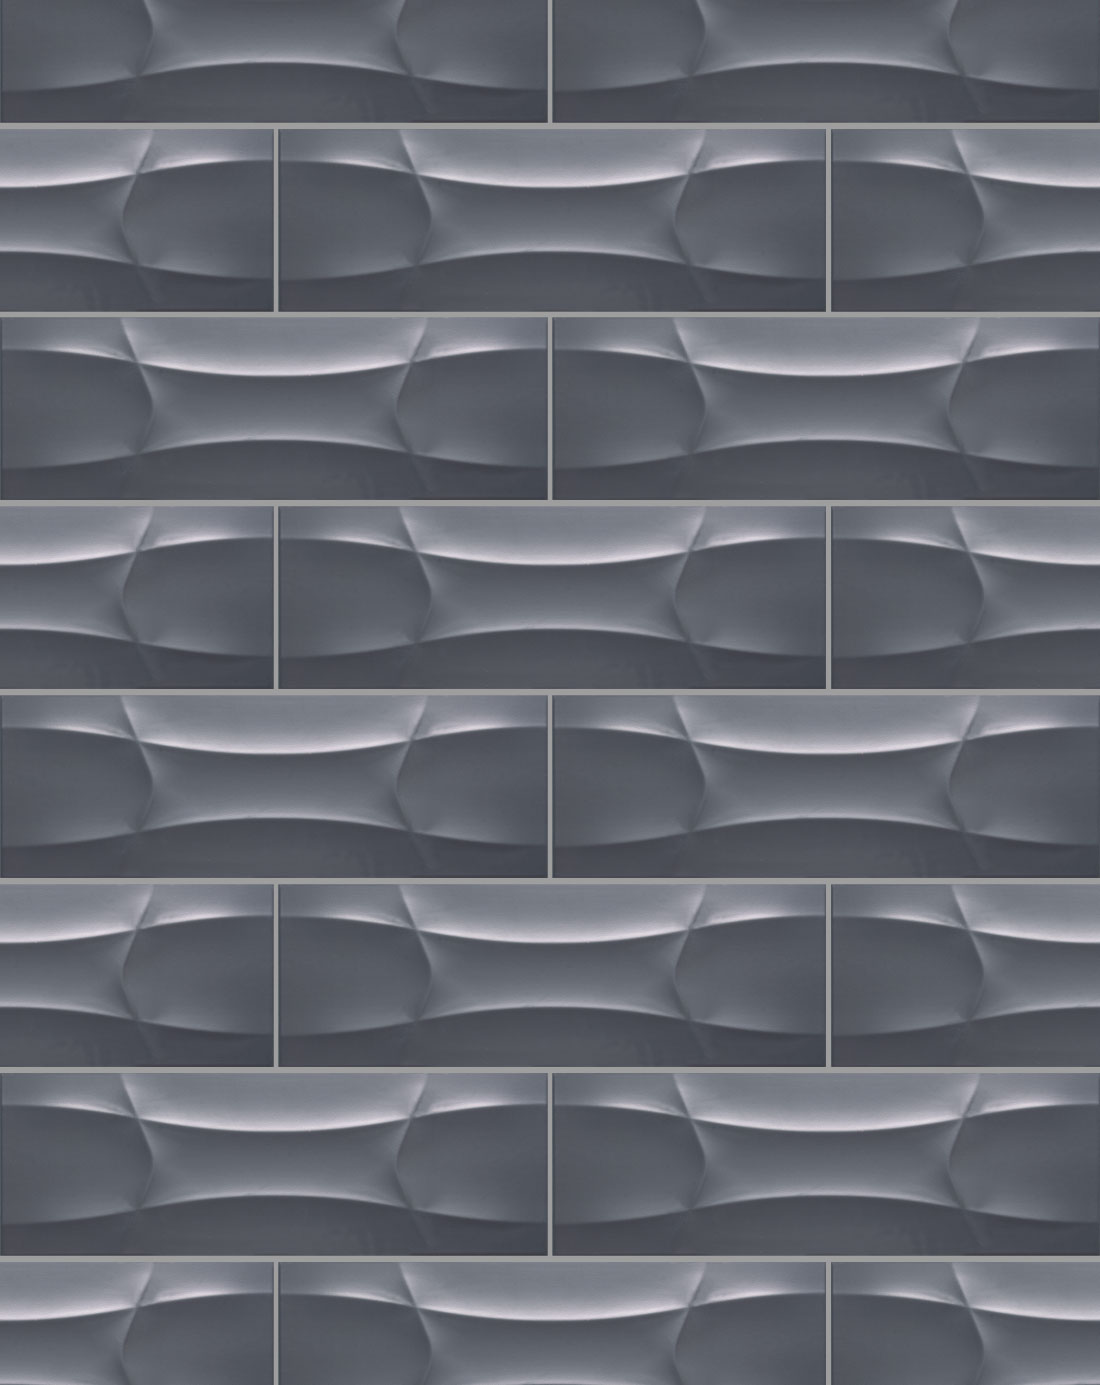 Solid Visual Wall Tile Bathroom Tiles Direct